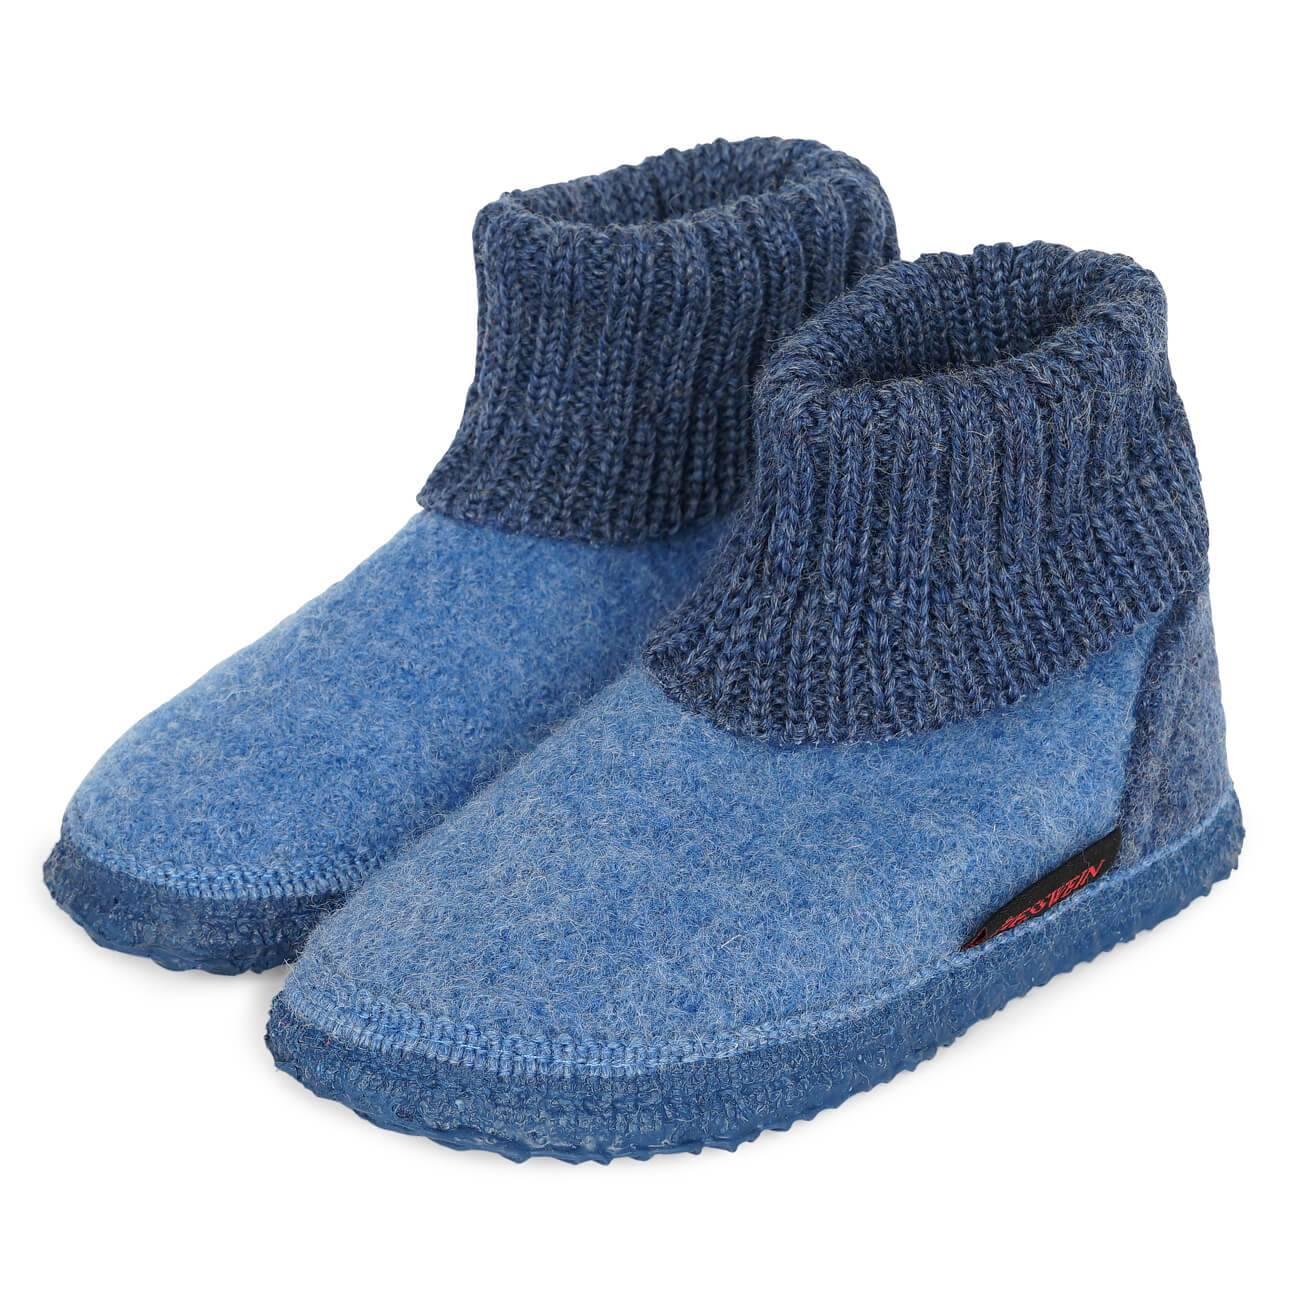 Giesswein Kramsach Kids blau capriblau Schuhe Hoher Hausschuh Damen